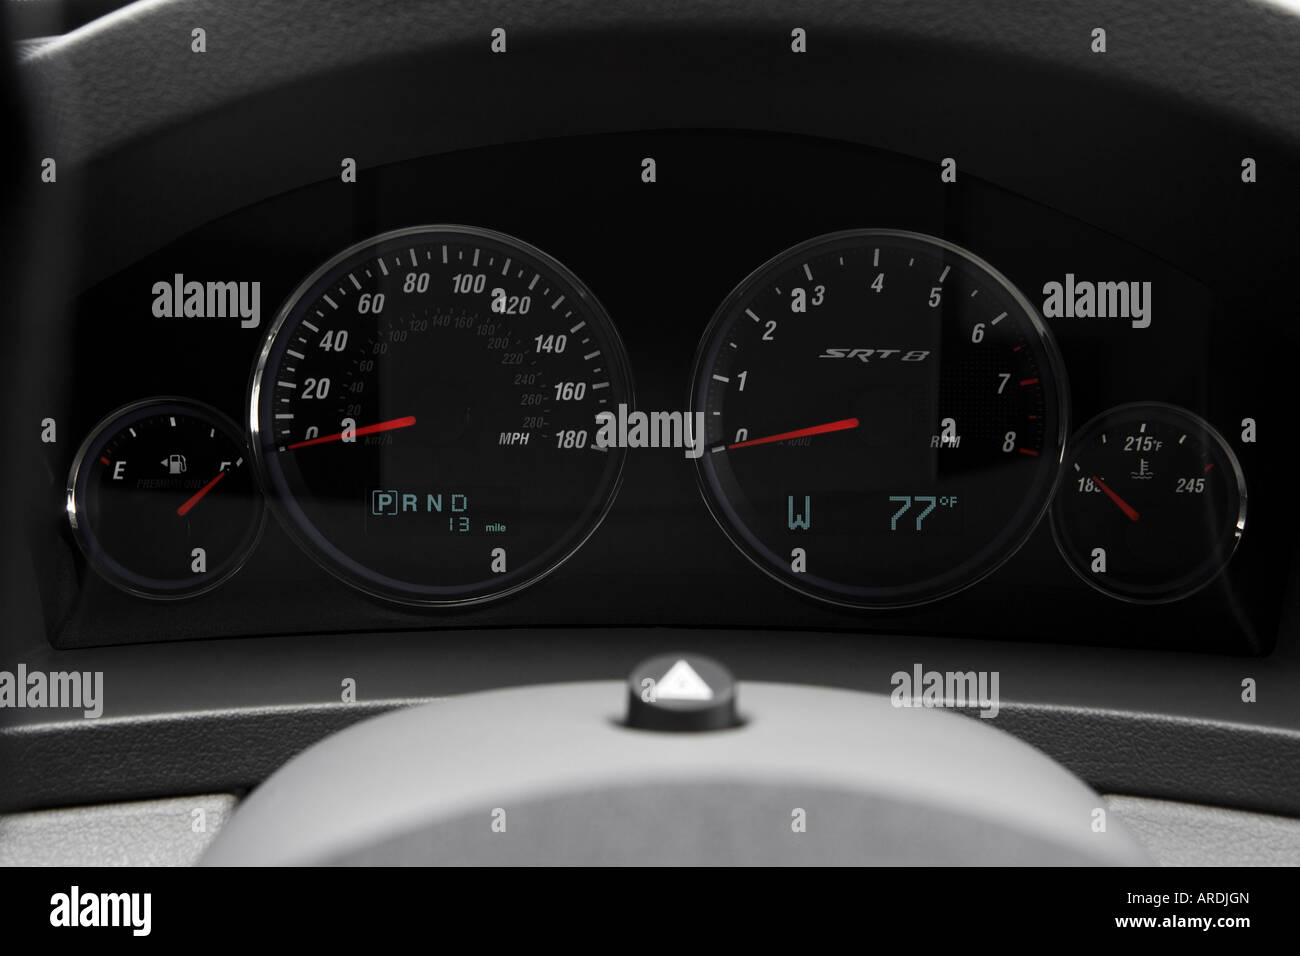 2006 Jeep Grand Cherokee SRT8 in Black - Speedometer/tachometer